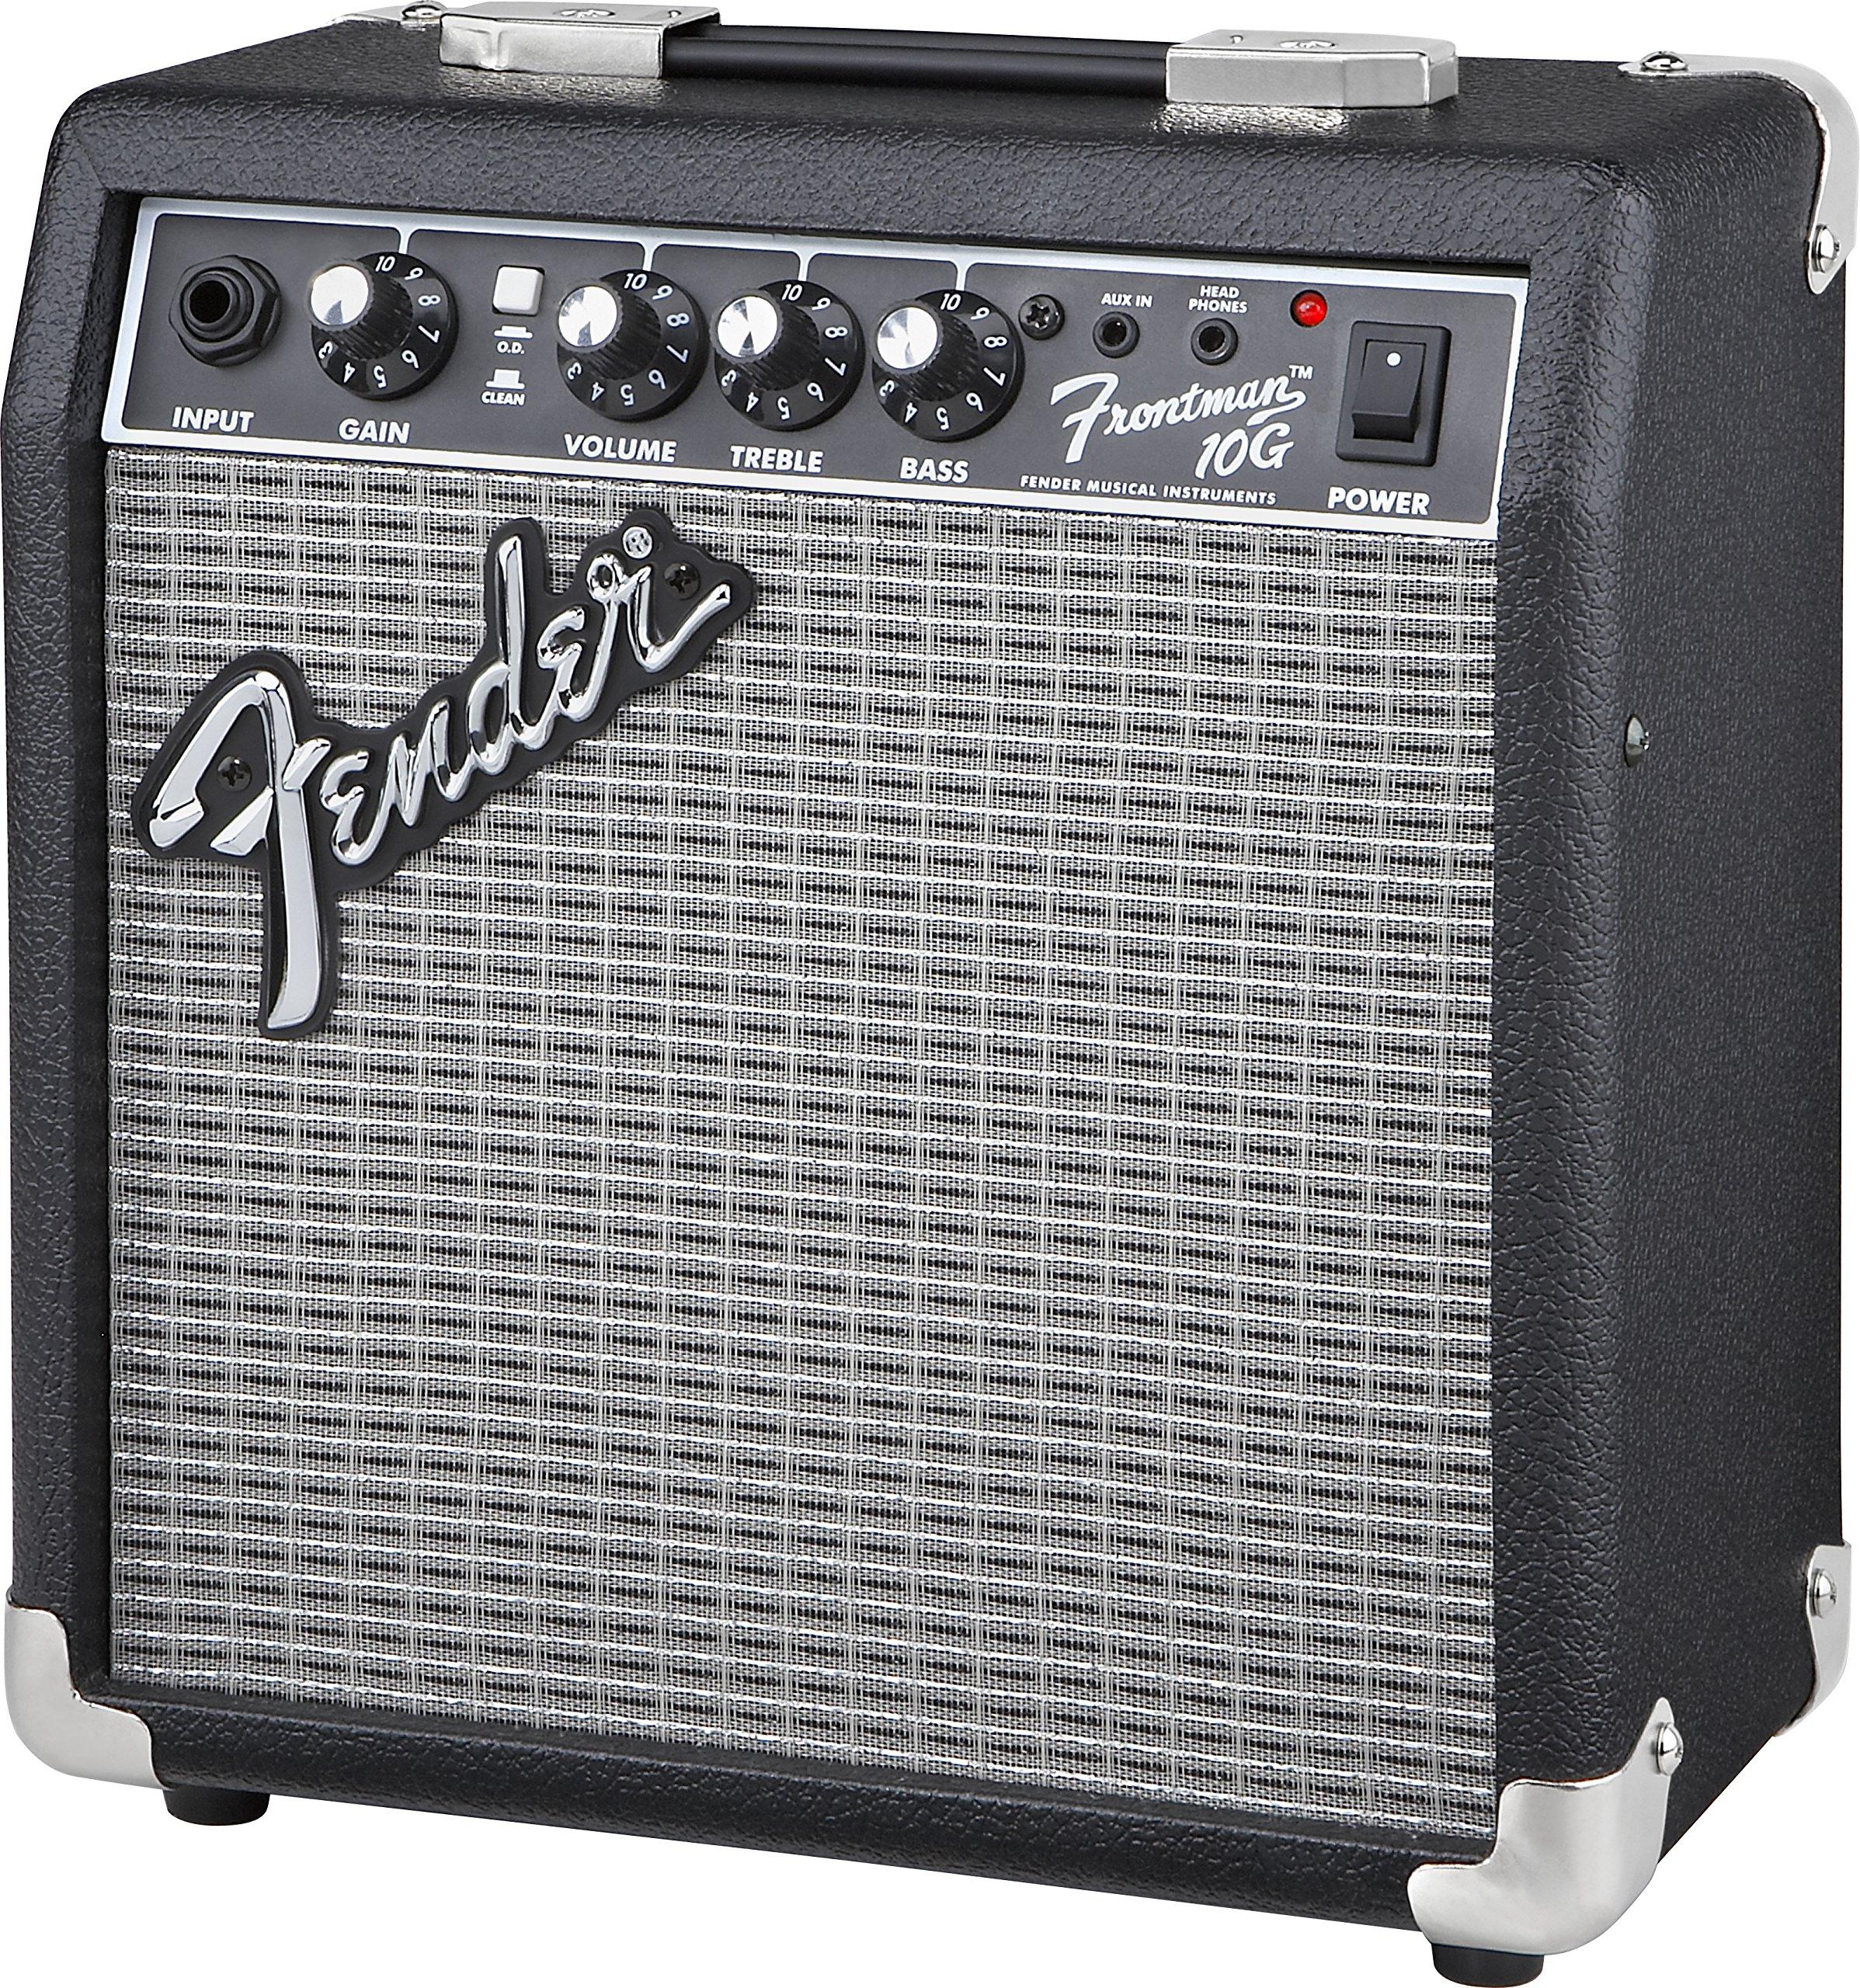 Fender Frontman 10G Electric Guitar Amplifier by Fender